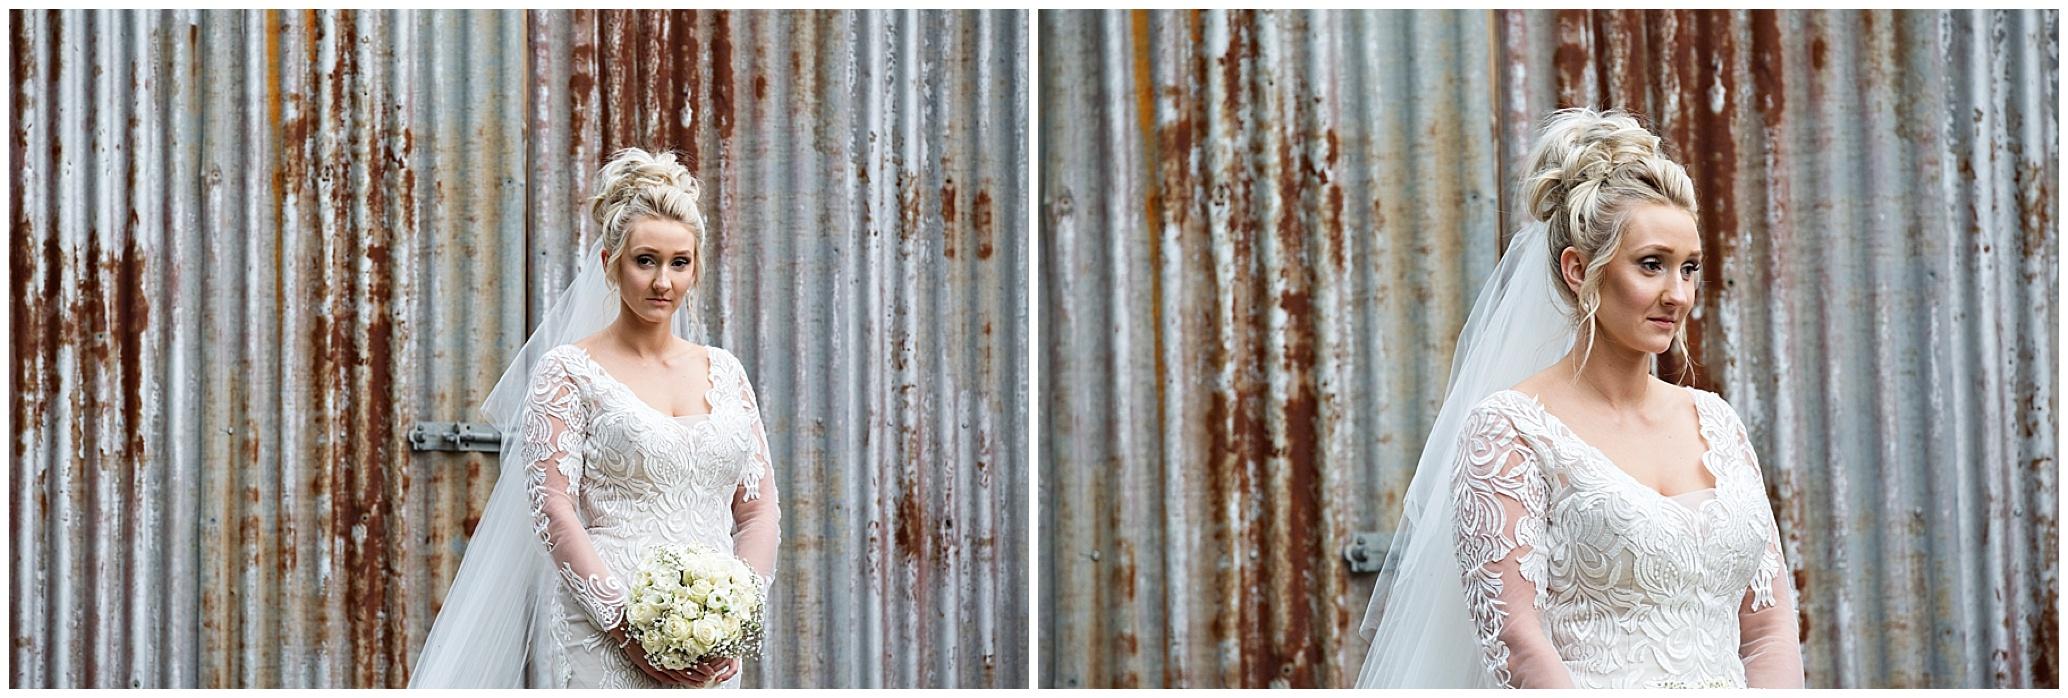 yarrawonga-wedding-photographer_0239.jpg